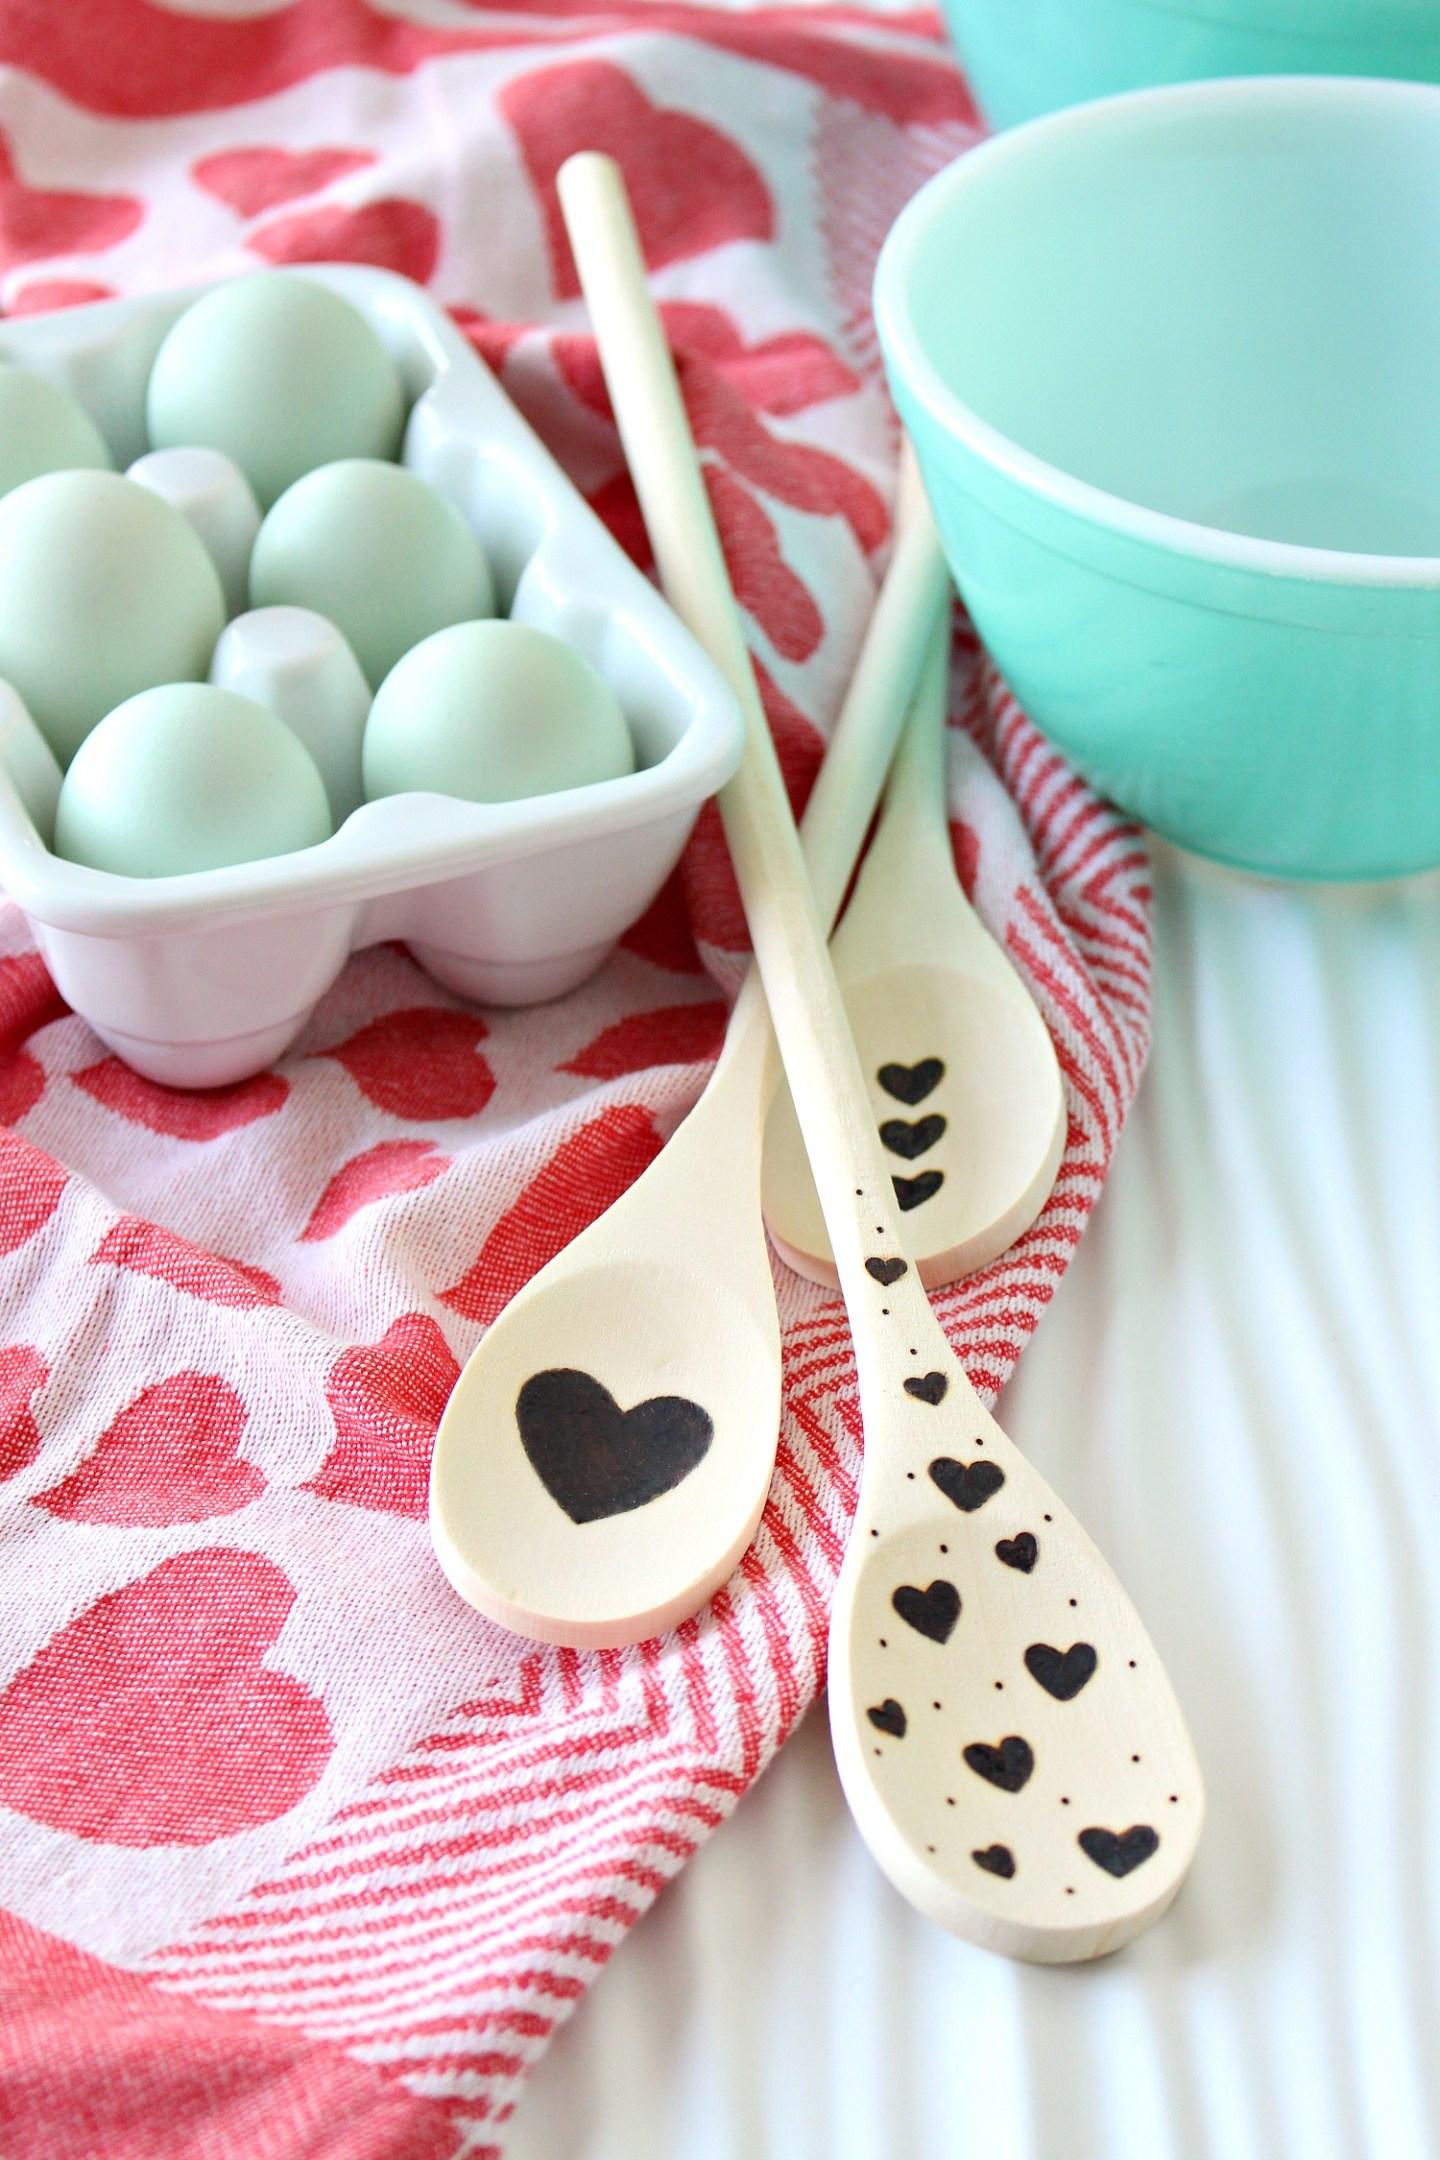 DIY Wood Burned Spoon | Easy DIY Valentine's Day Gift Idea